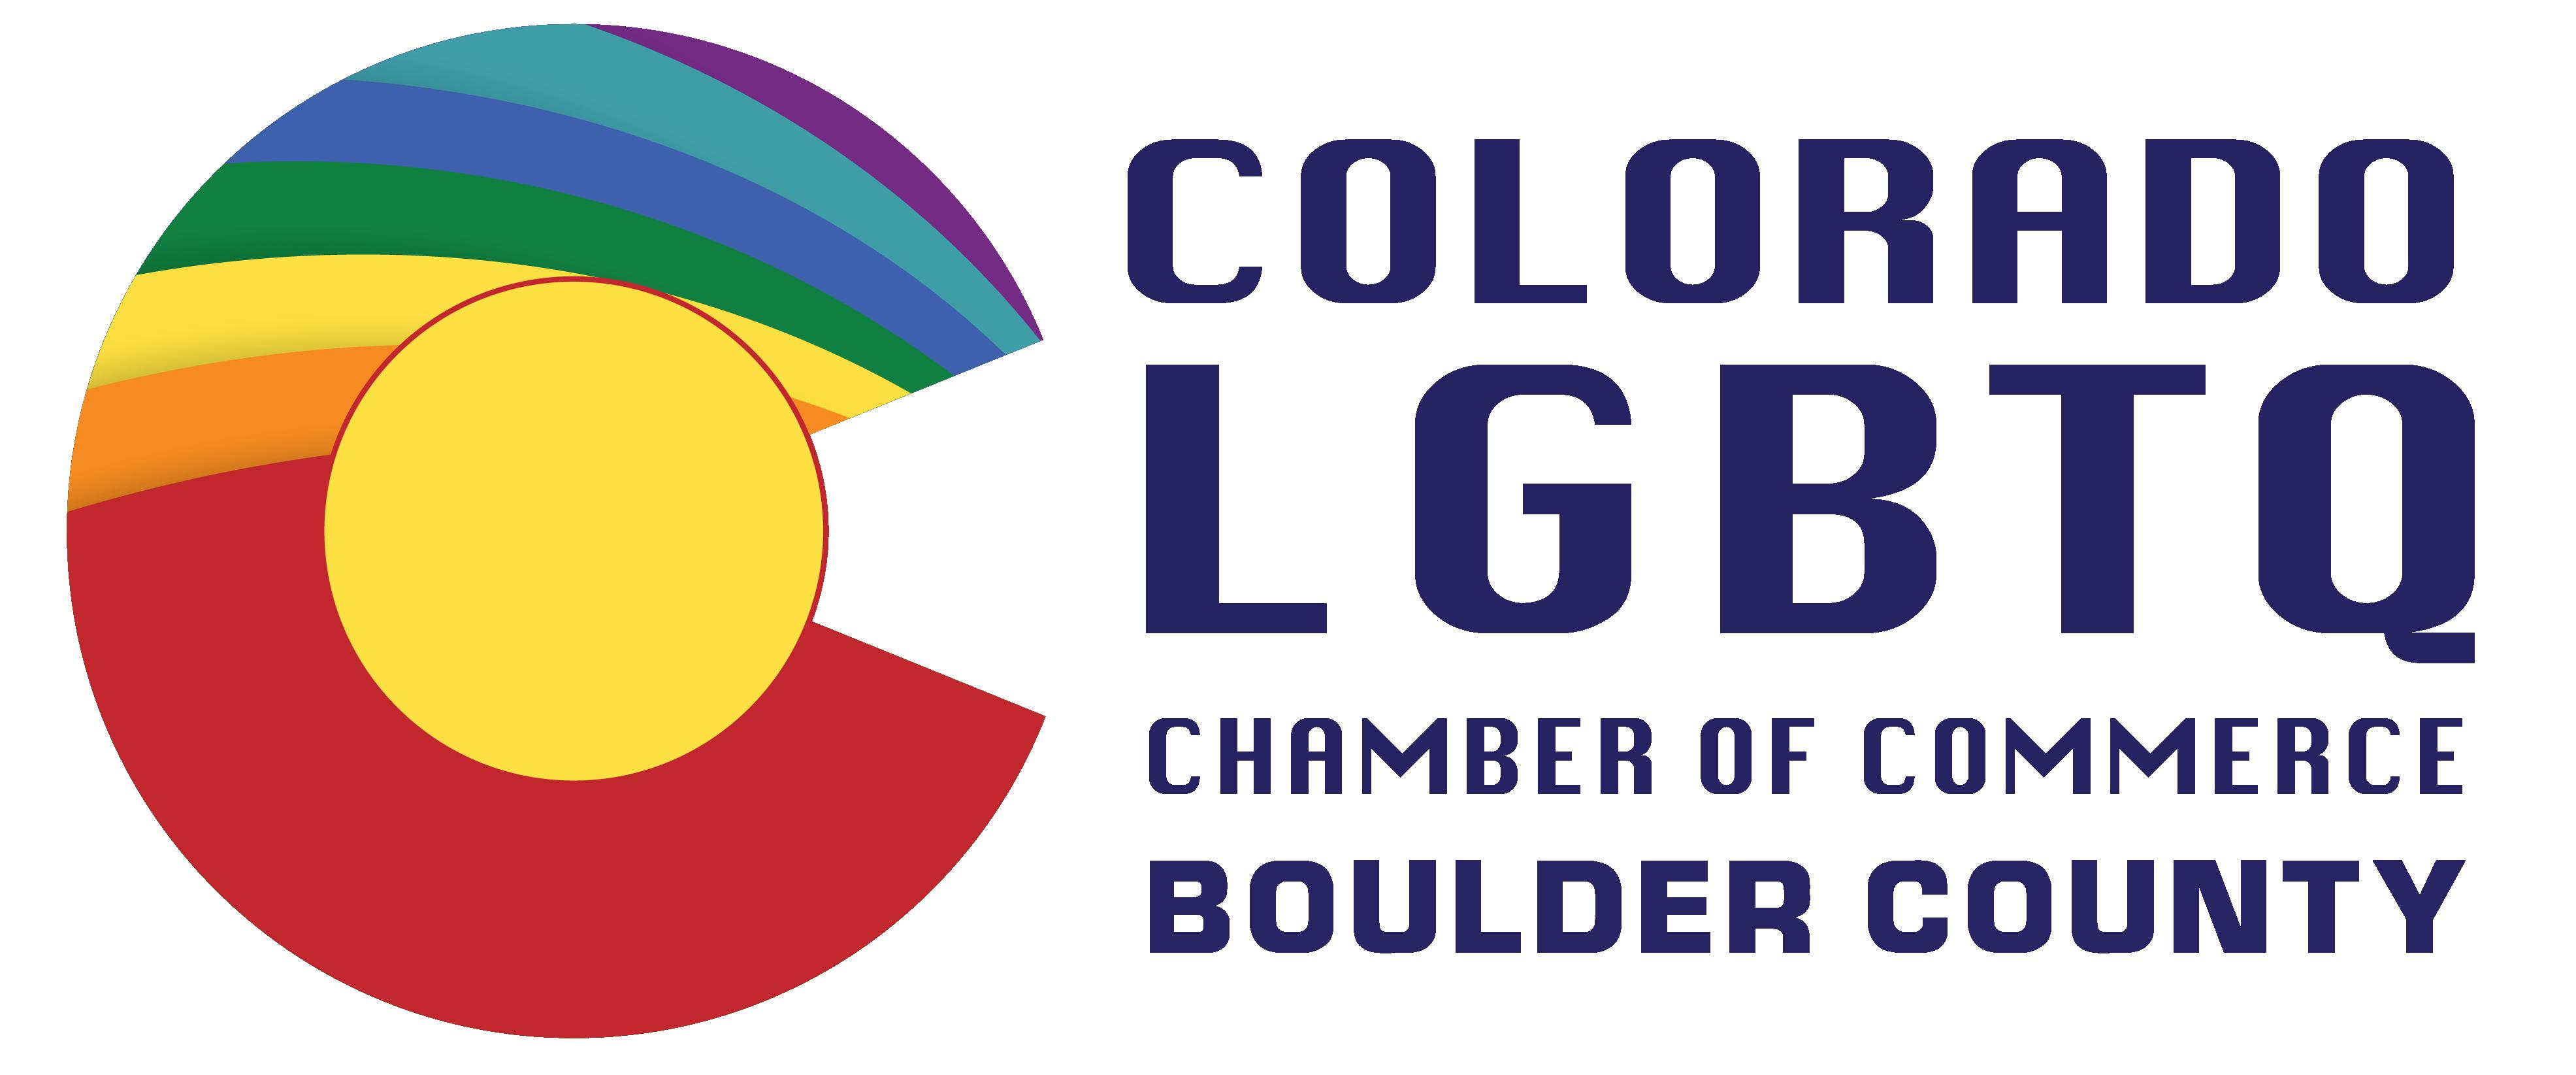 COLGBTQ_BoulderCounty_Logo_Horizontal